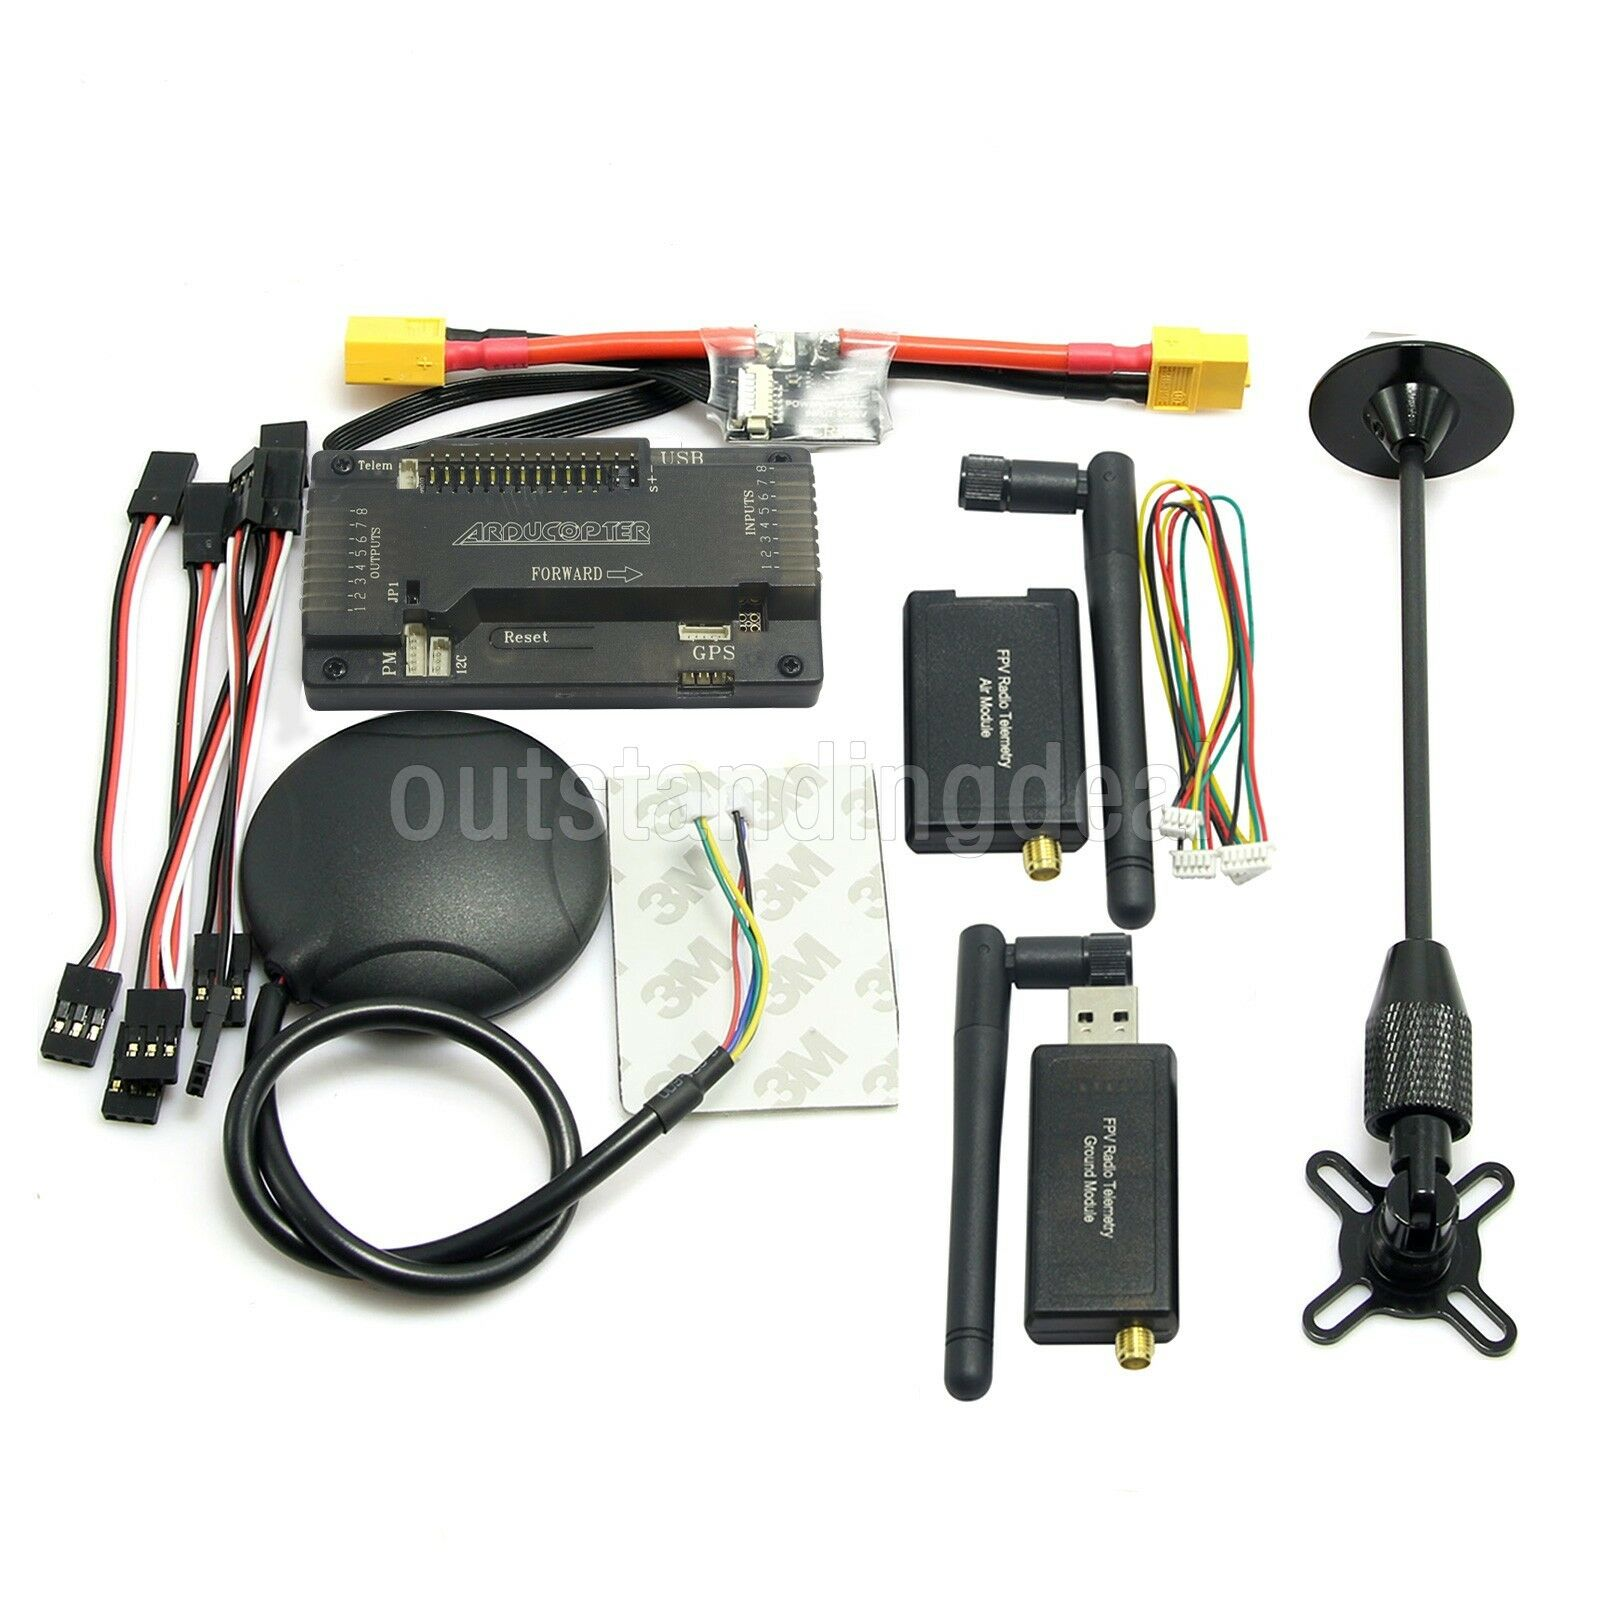 Apm2.8 ARDUPILOT APM Flight Controller without Compass + GPS + Telemetry + Power os12